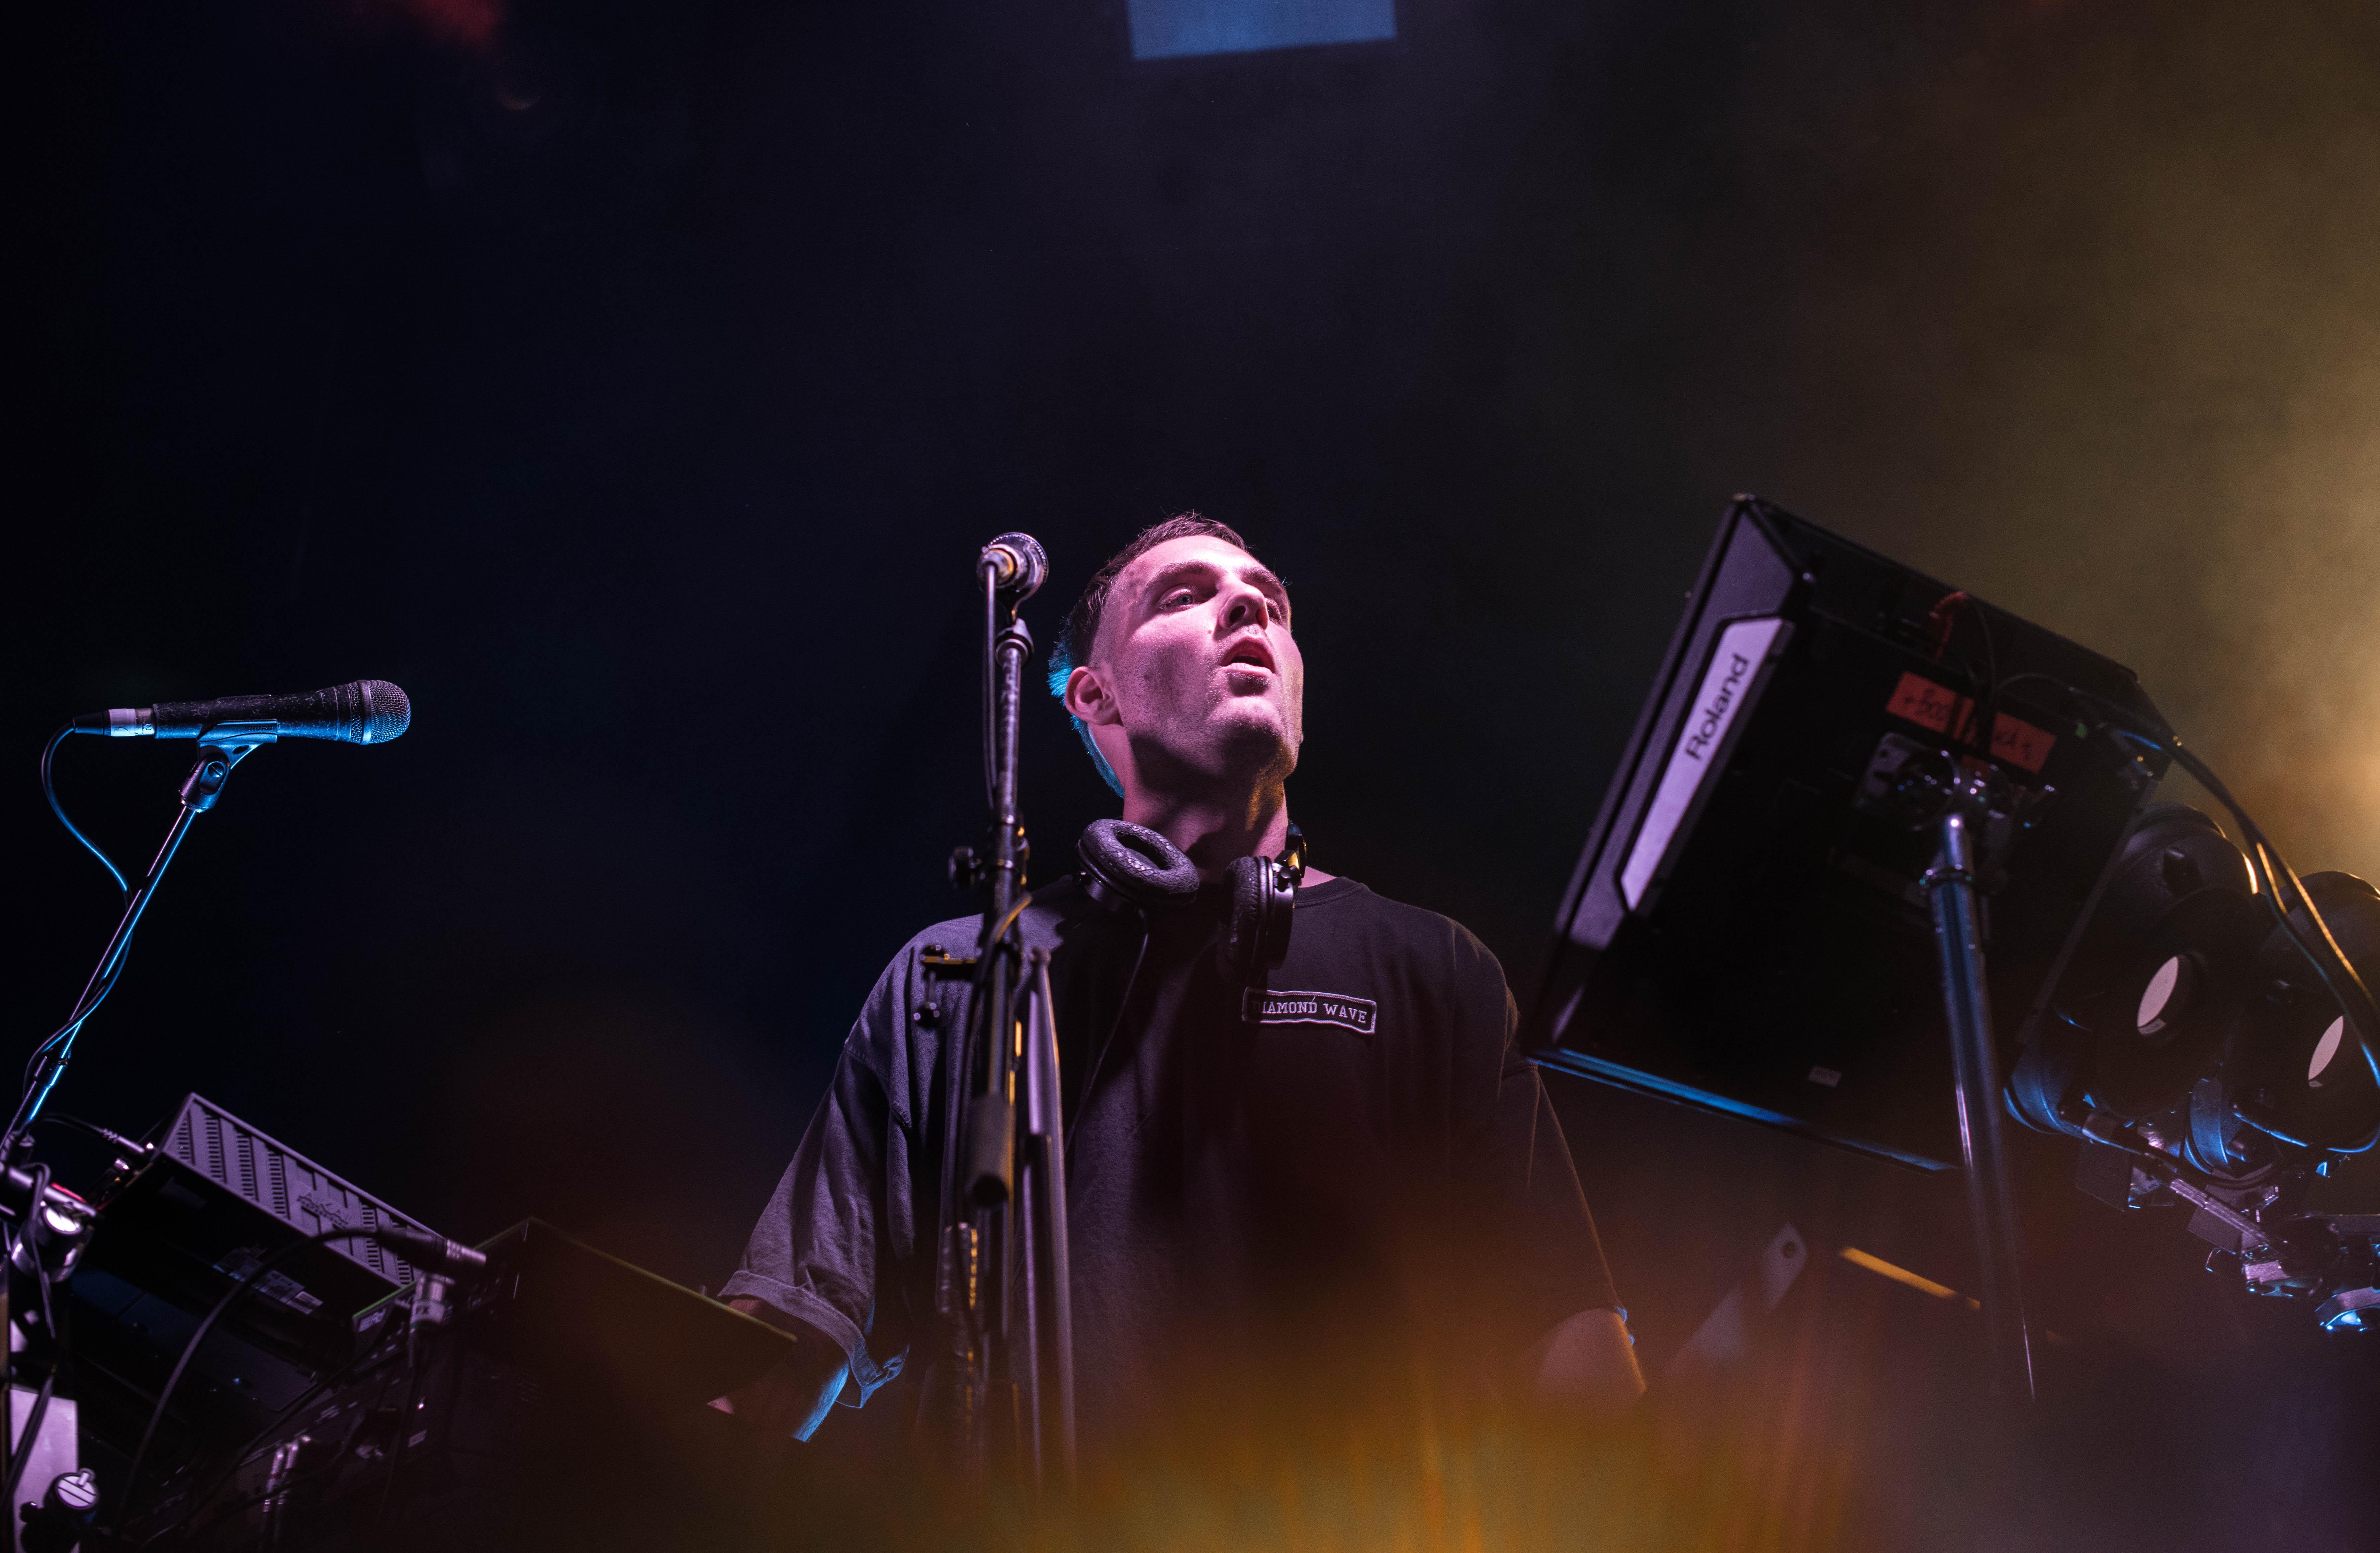 boo seeka music live review sydney photo credit dominique burns blackwell savage thrills savagethrills 5